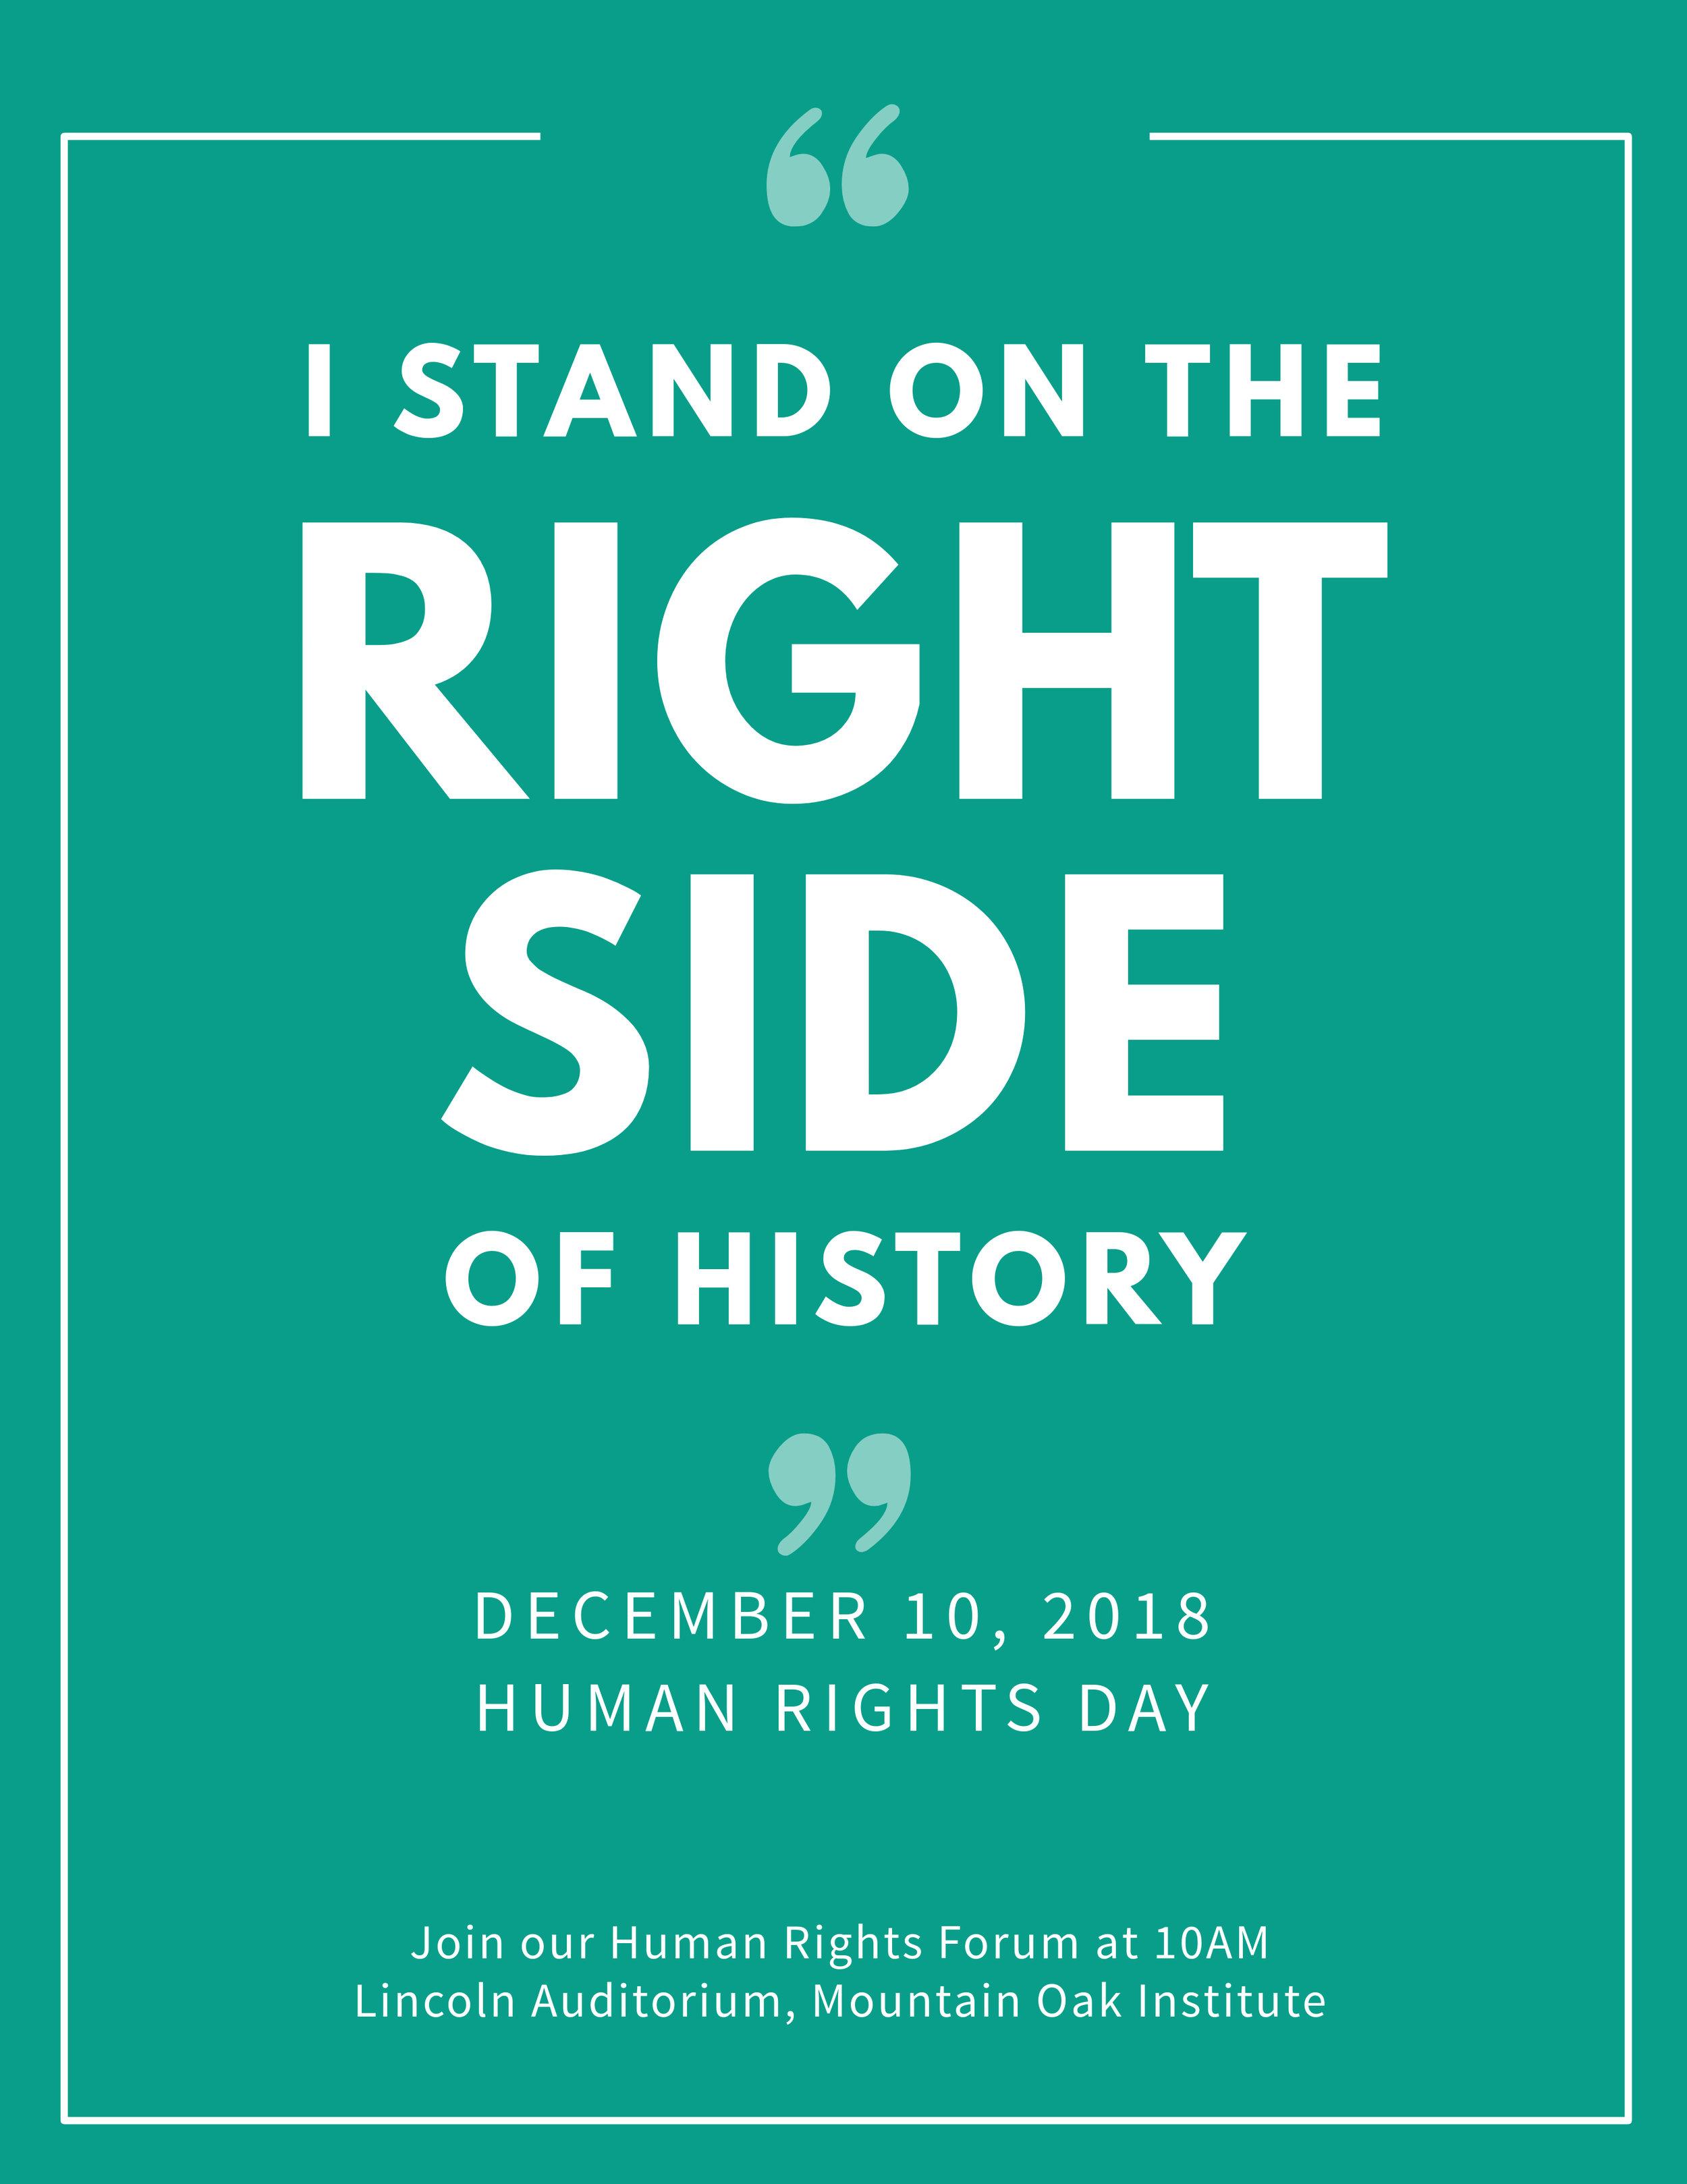 Copy of Human Rights Slogan Flyer Template.jpg